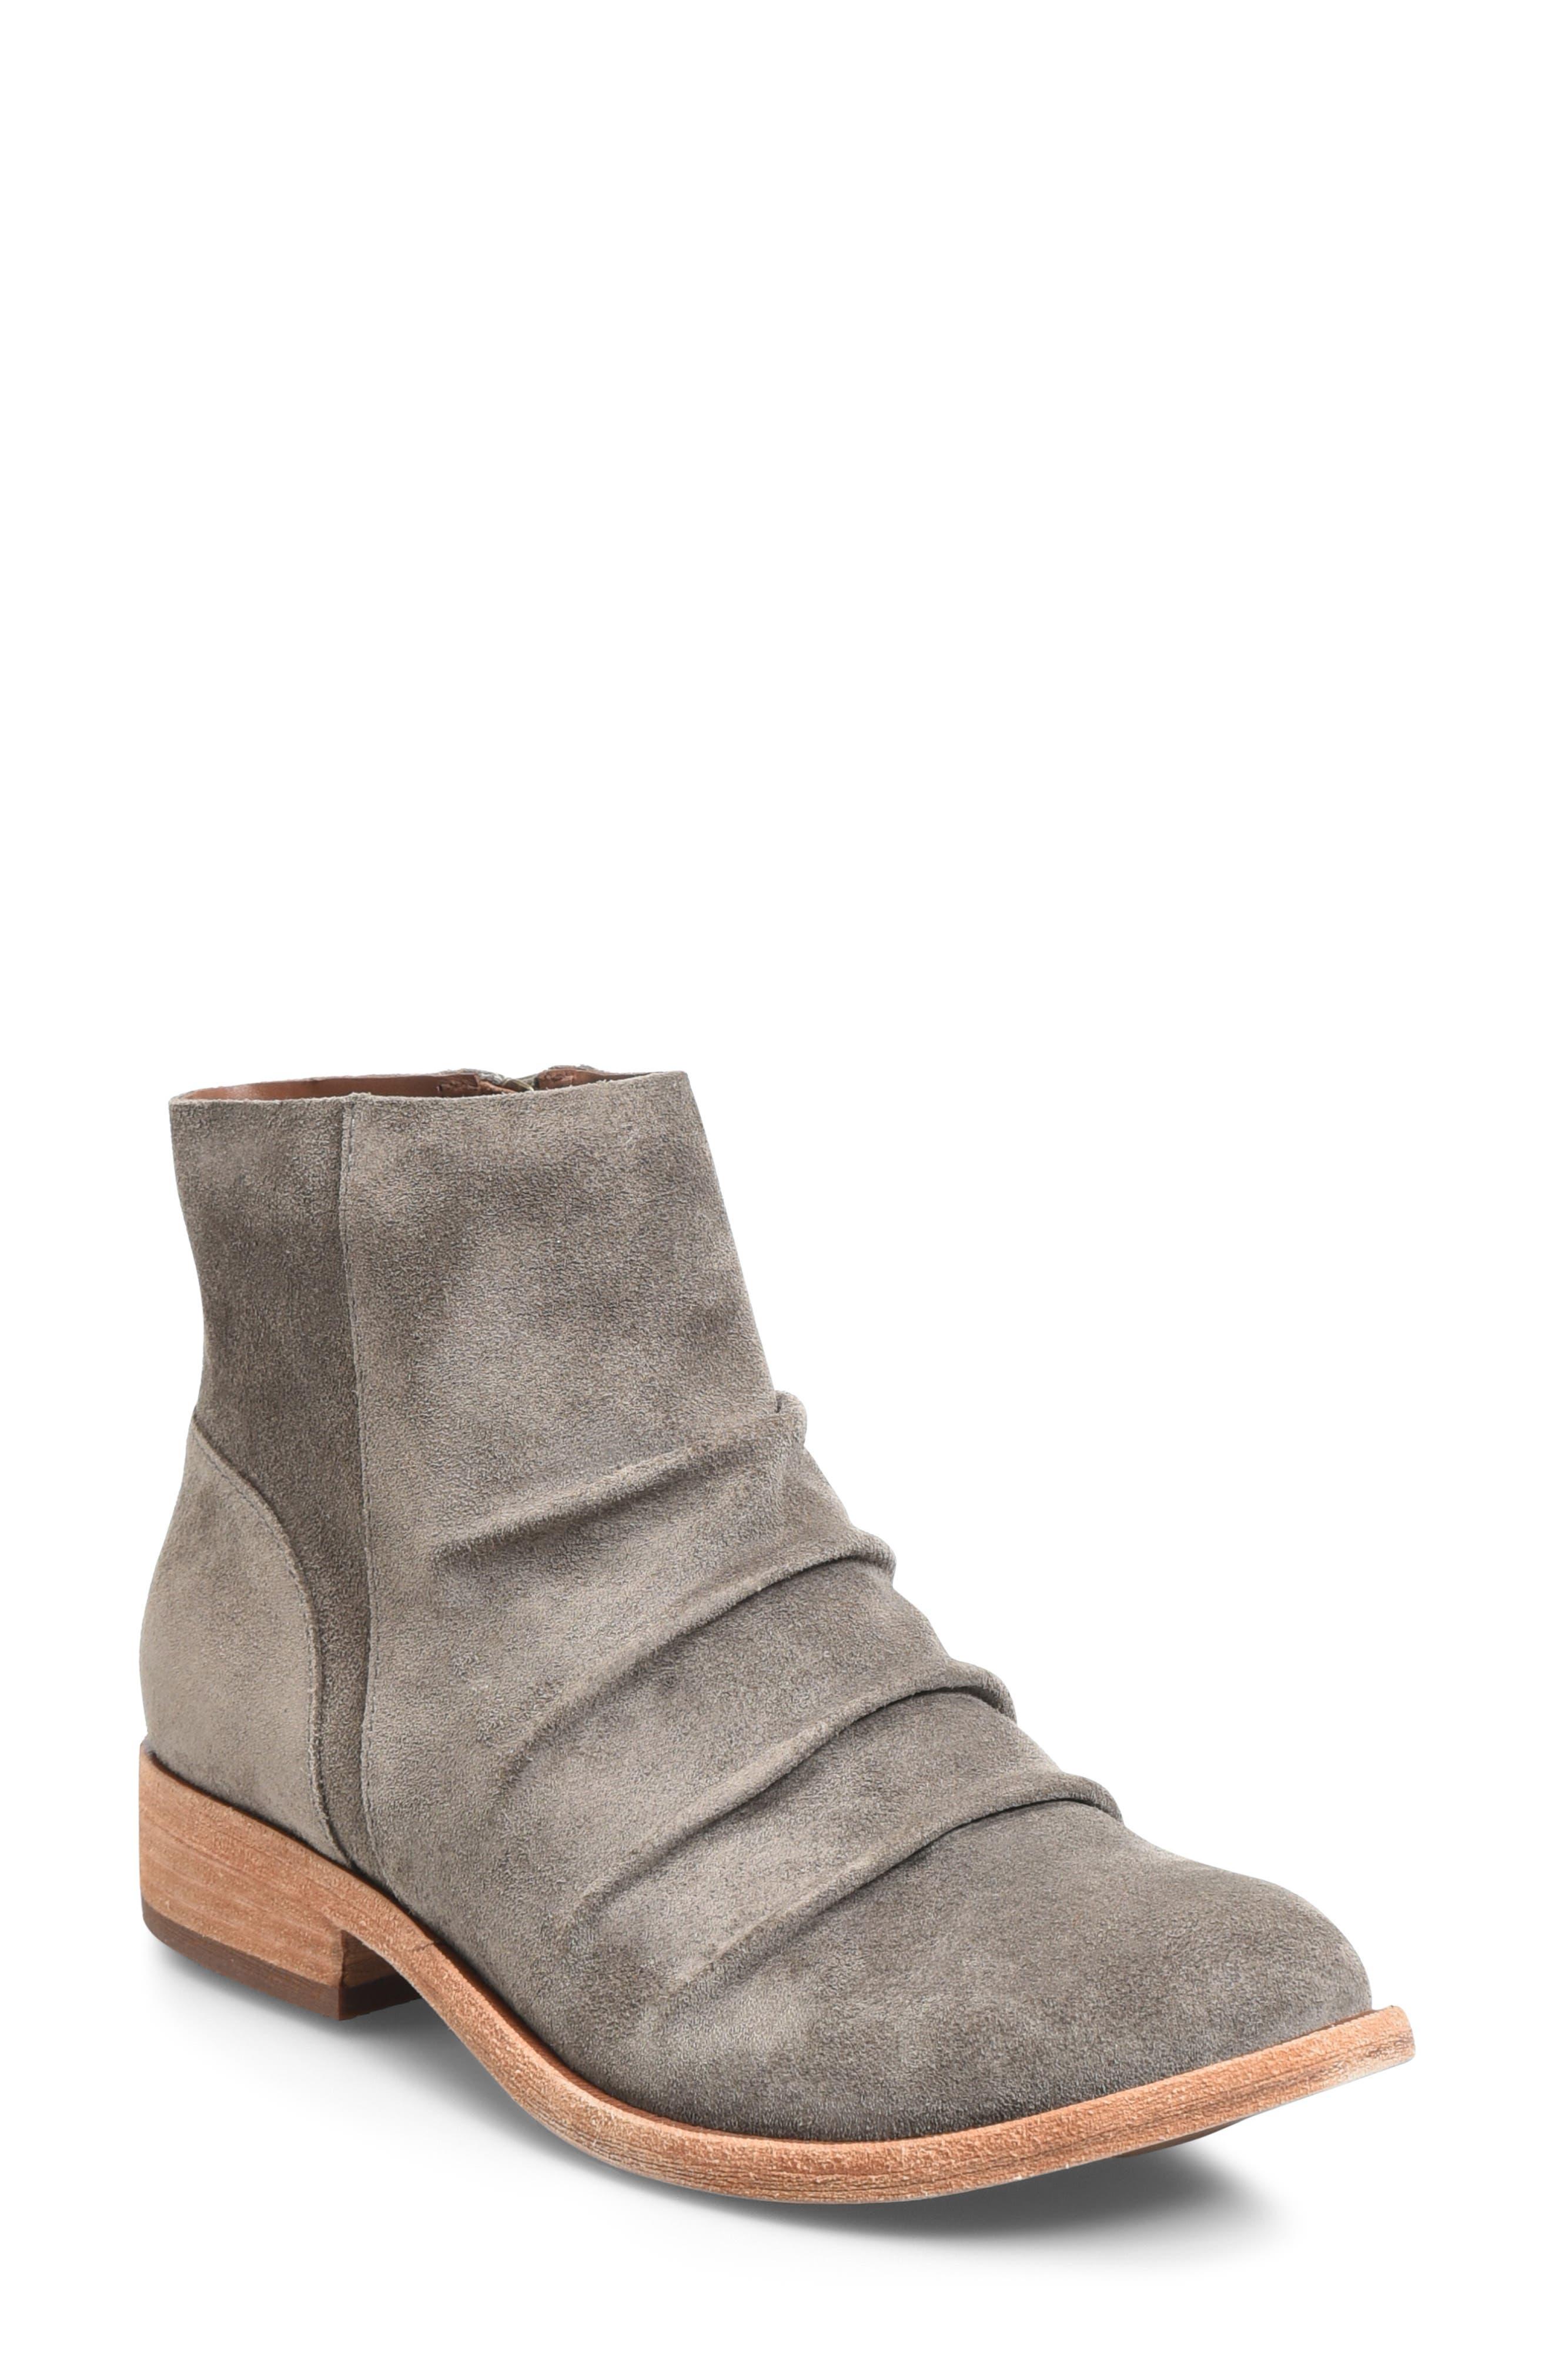 KORK-EASE<SUP>®</SUP> Giba Boot, Main, color, GREY SUEDE